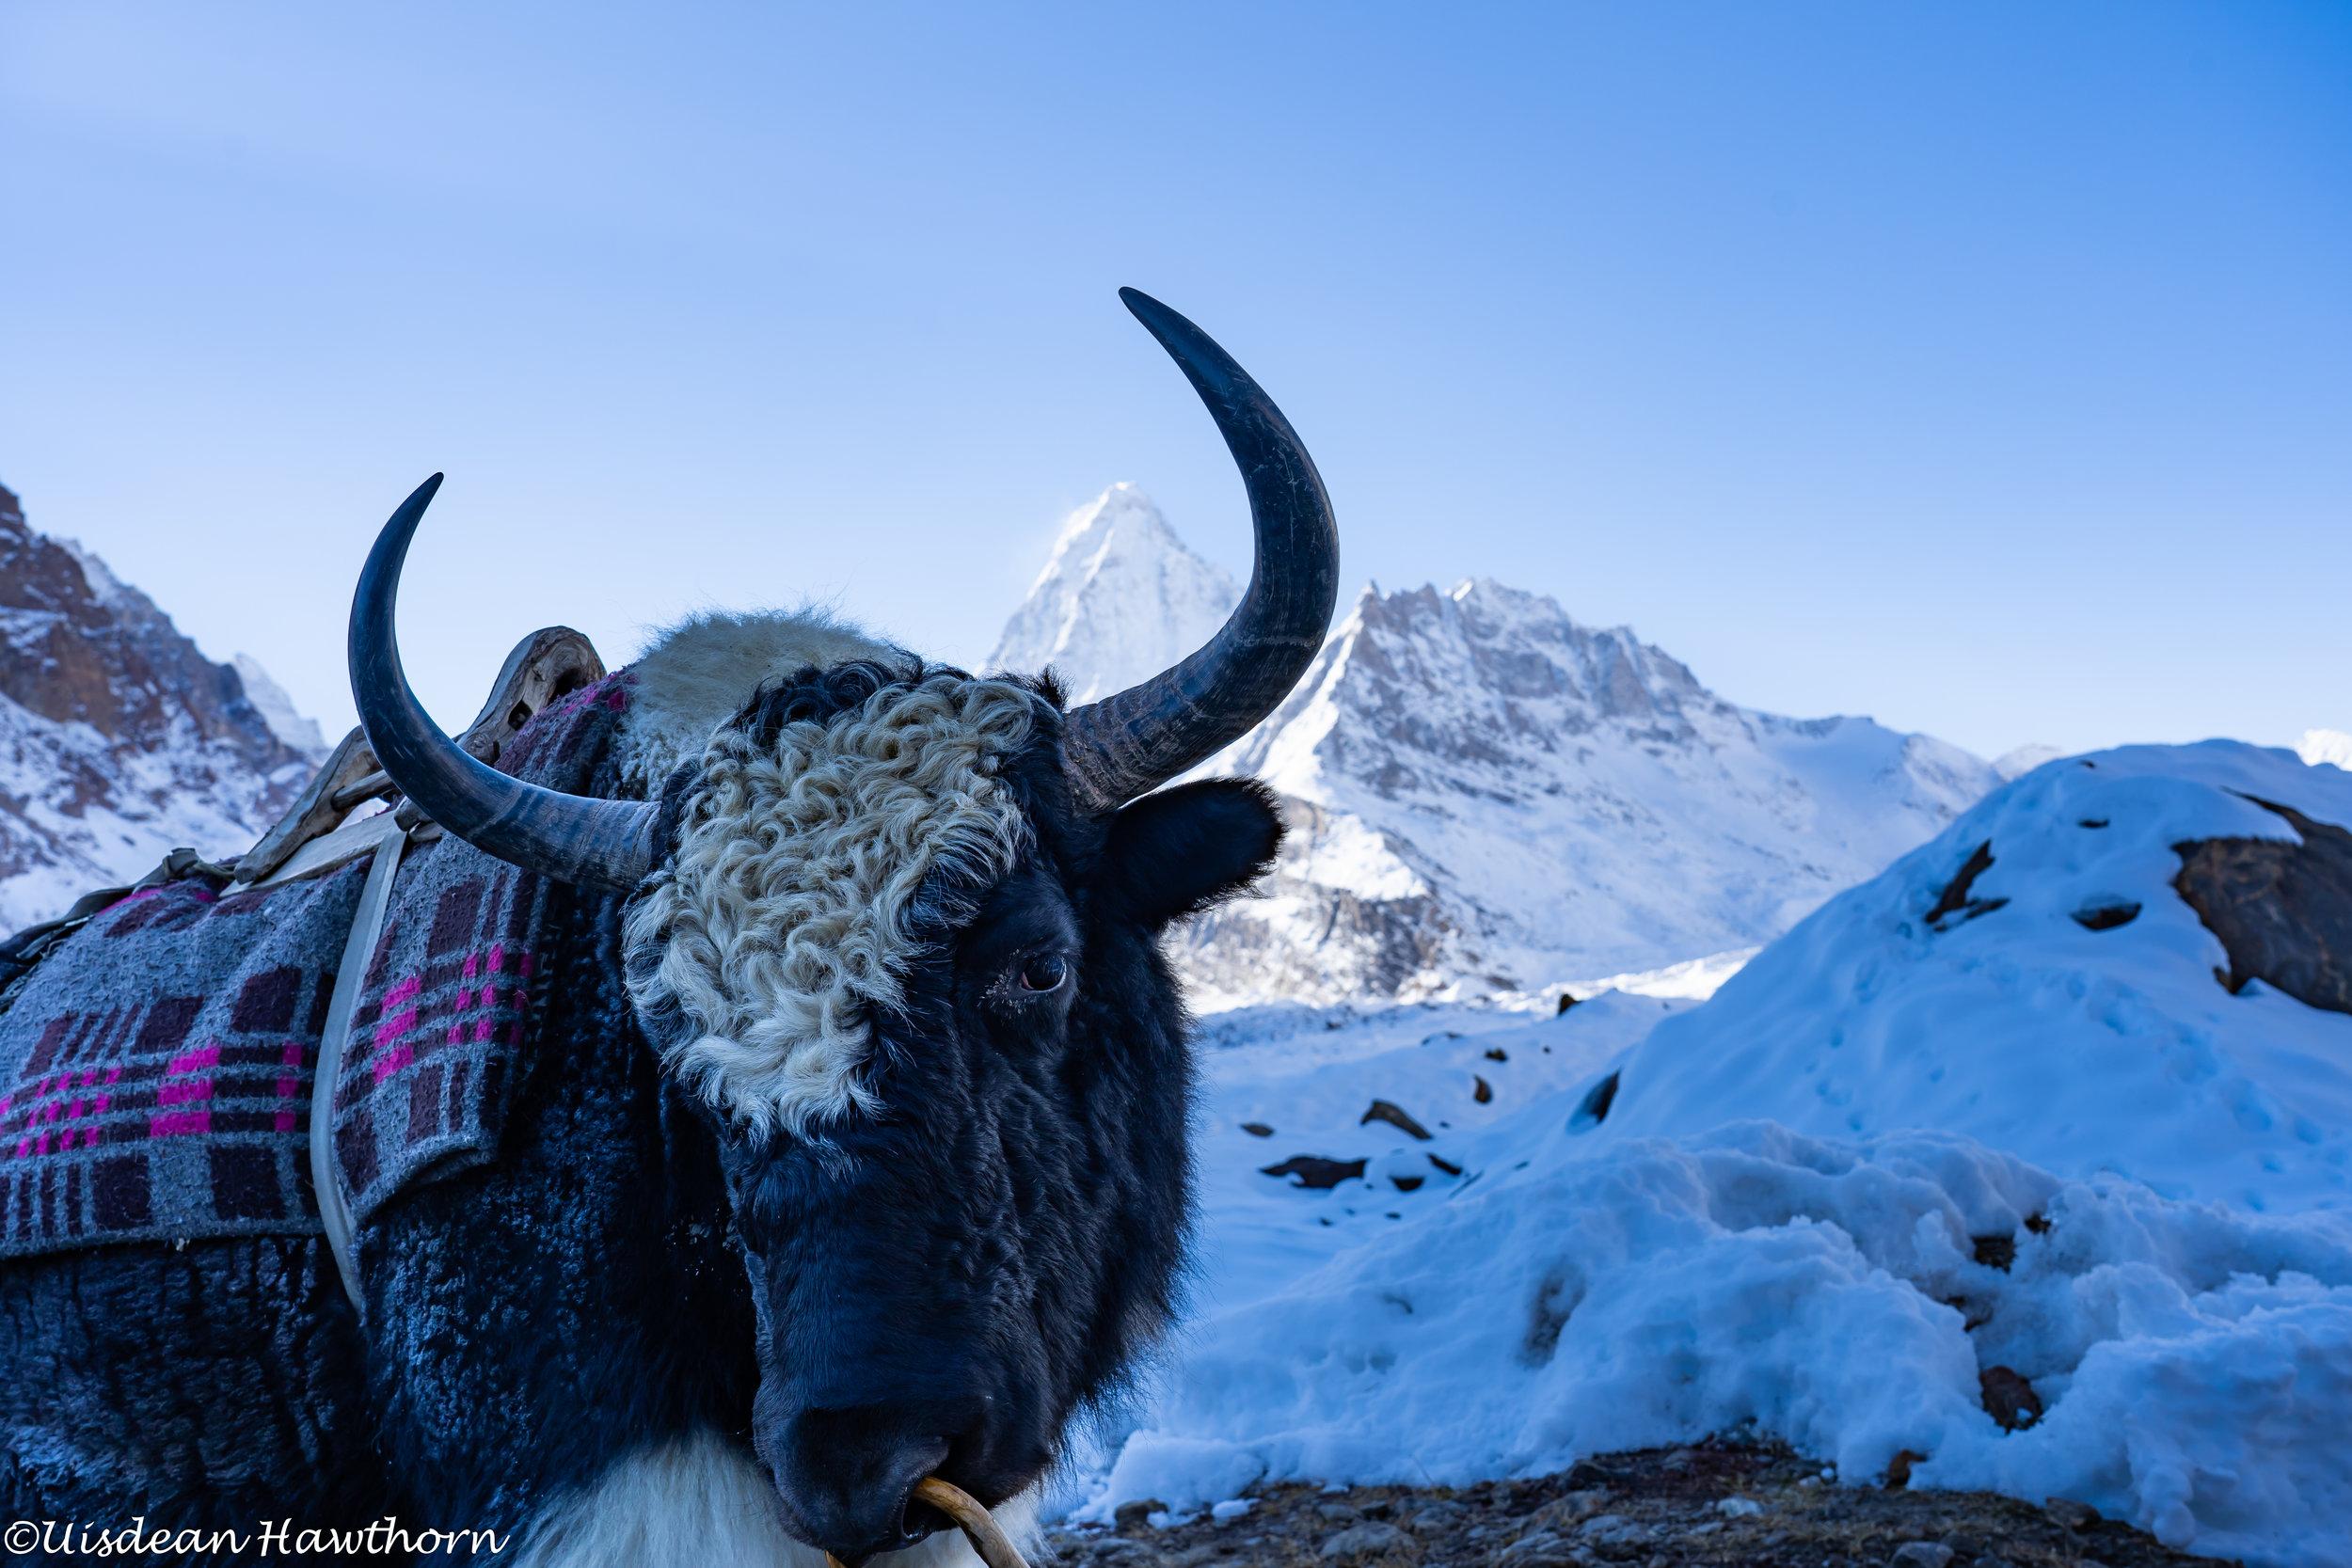 Yak yak yak! And Hagshu in the background. Photo: Uisdean Hawthorn